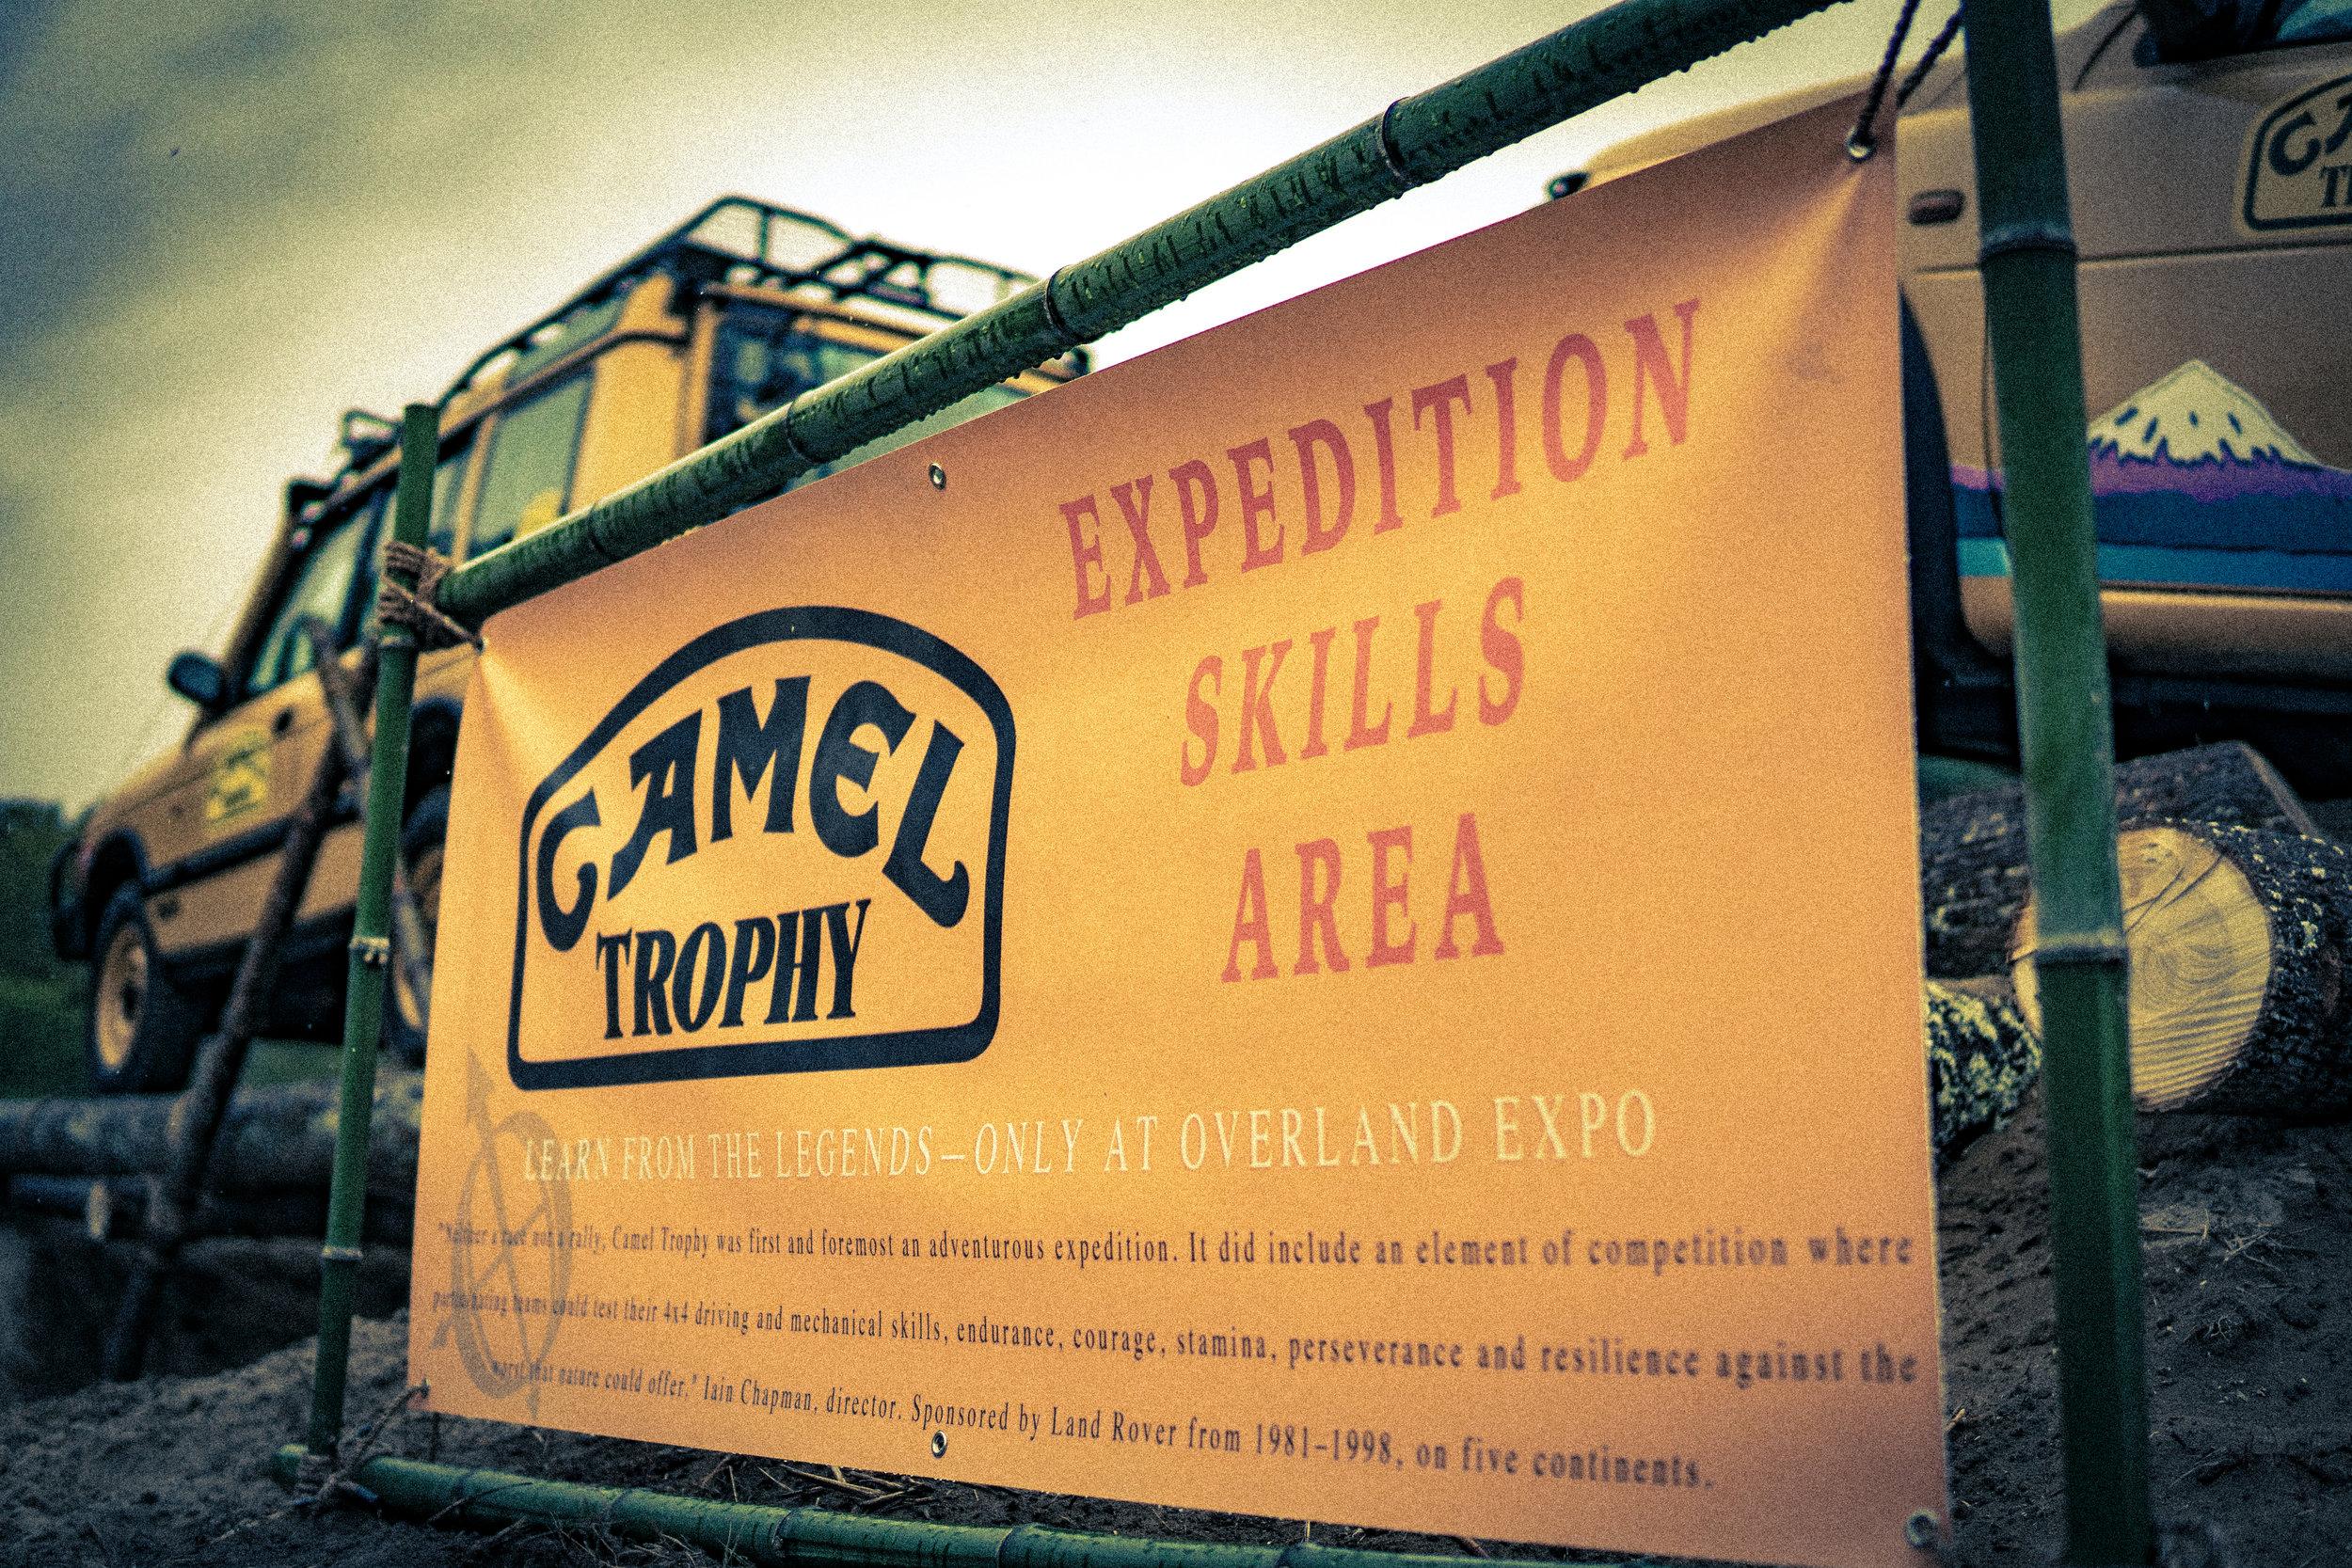 Camel Trophy Expedition Skills